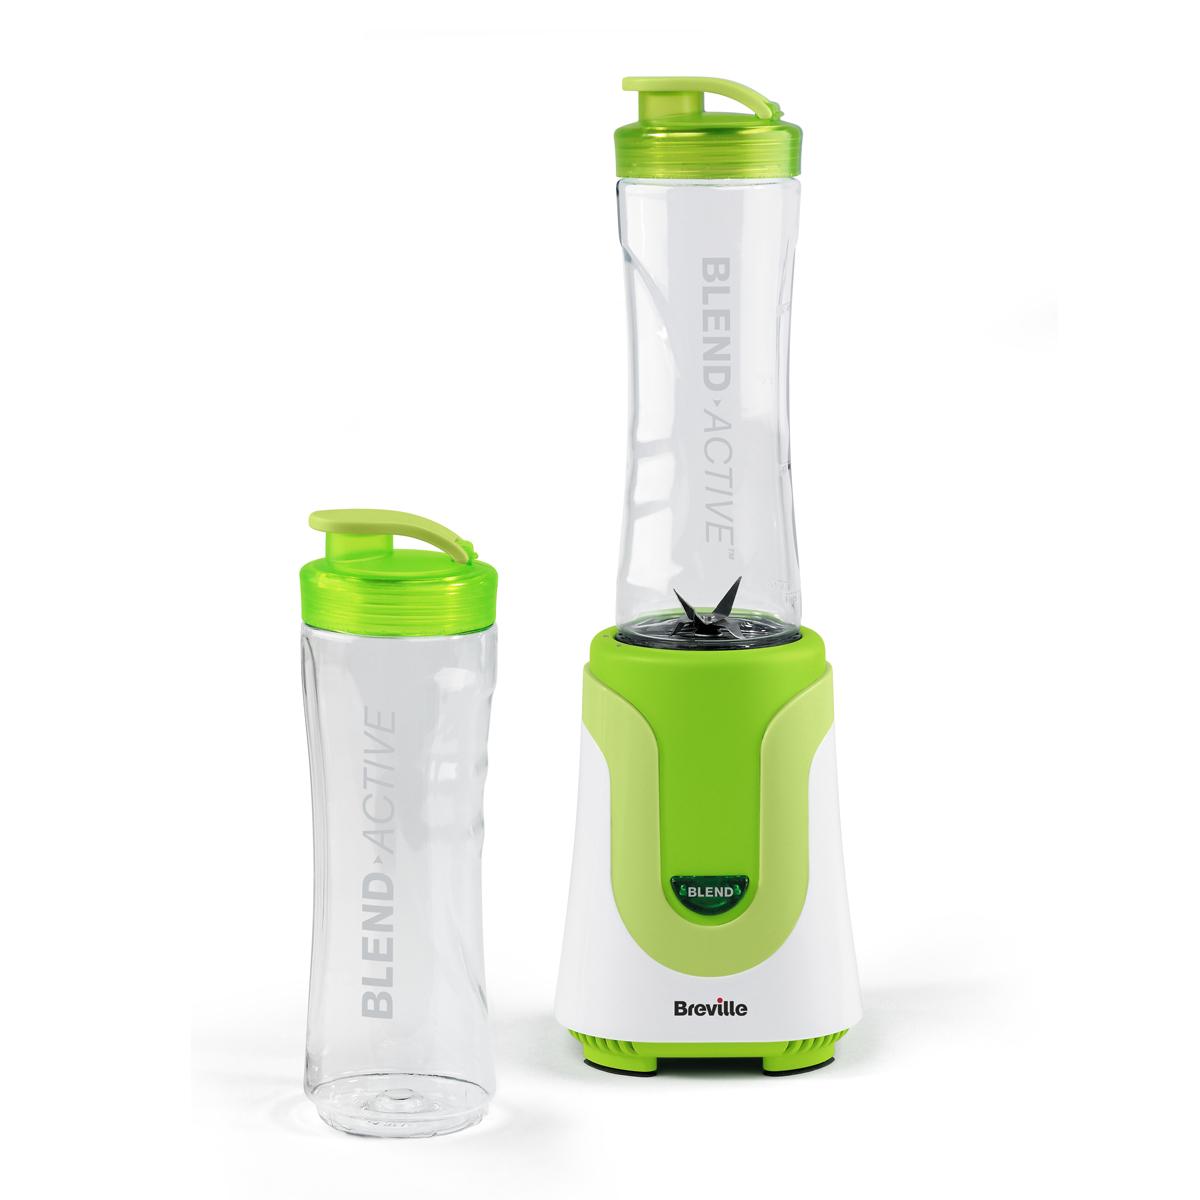 Breville Blend Active Personal Blender with x2 600ml Bottles, Green